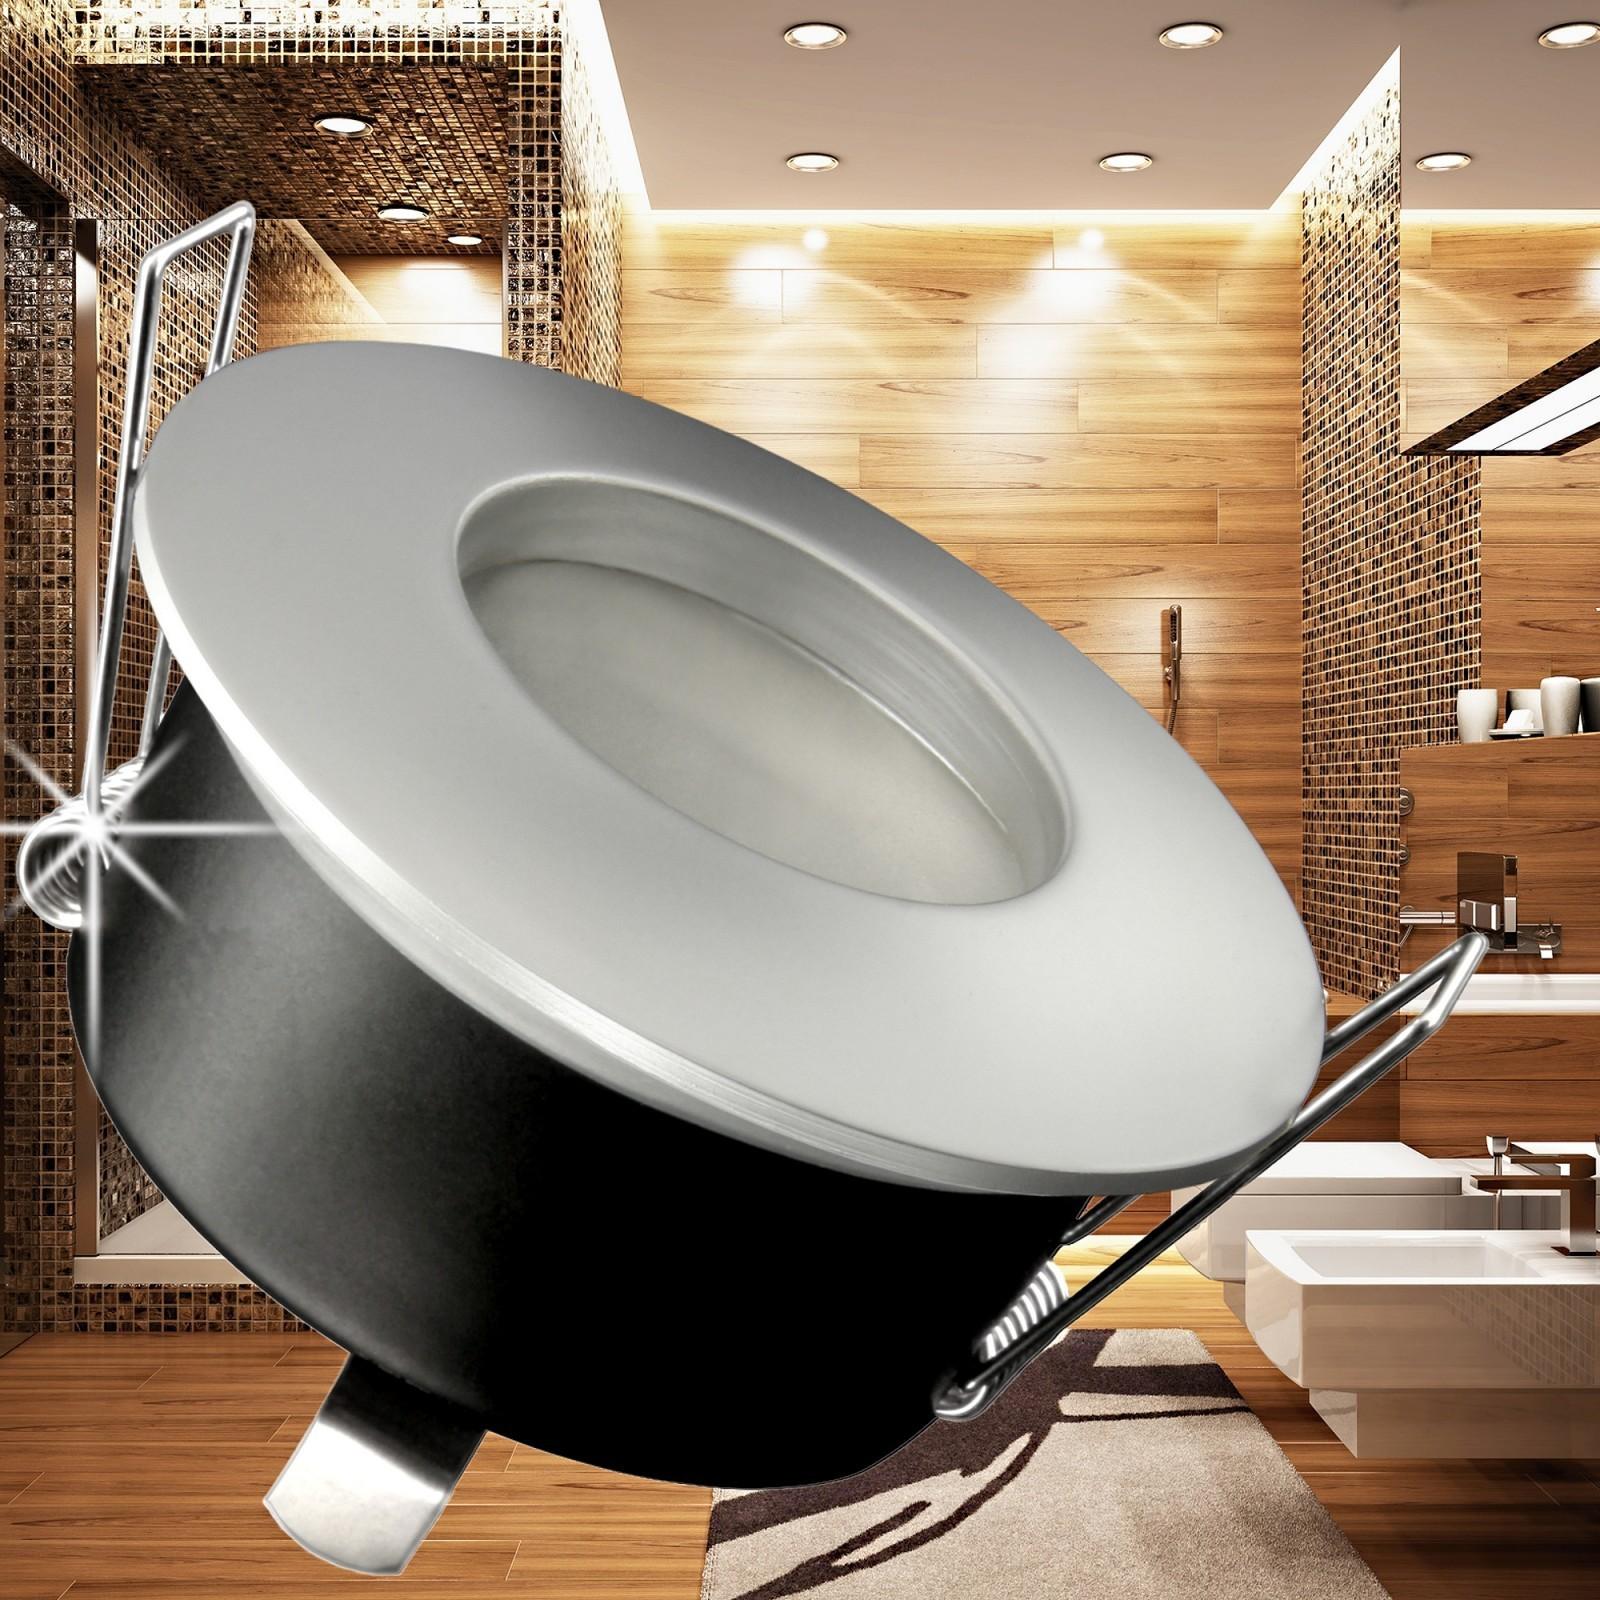 rw 1 feuchtraum led einbaustrahler au en ip65 3 5w smd led. Black Bedroom Furniture Sets. Home Design Ideas